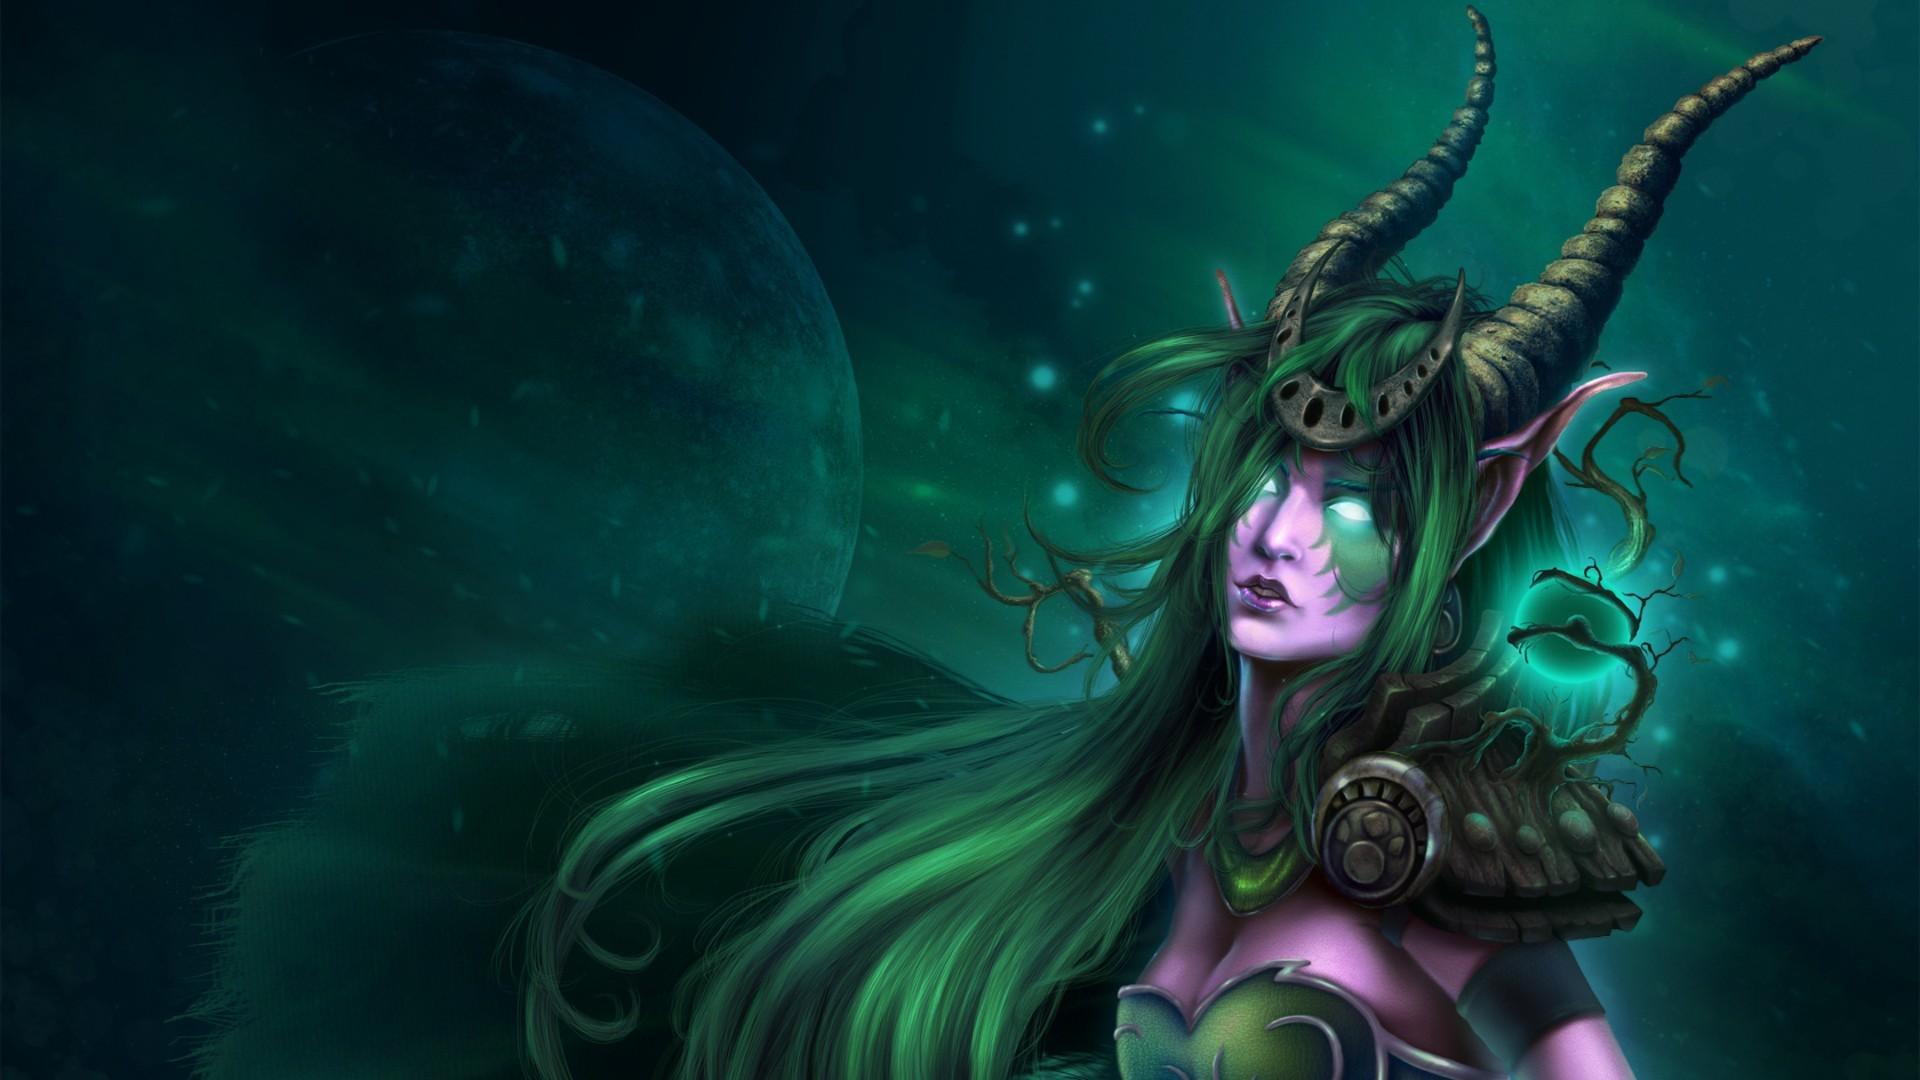 World Of Warcraft Wallpaper Druid – Dota 2 and E-Sports Geeks Dota .